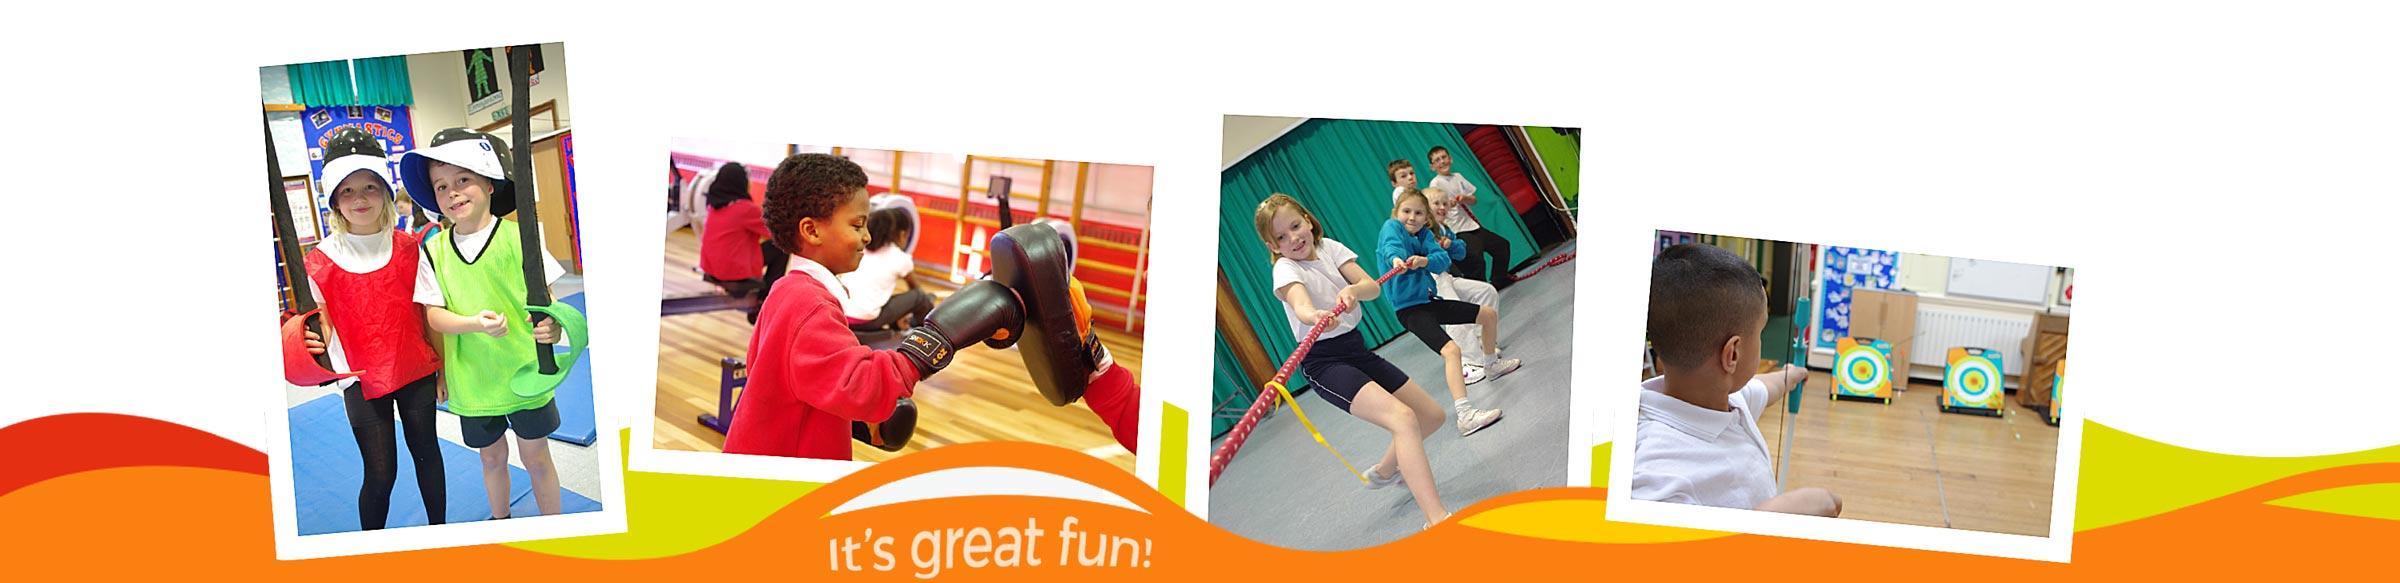 School Sports Olympics Workshops